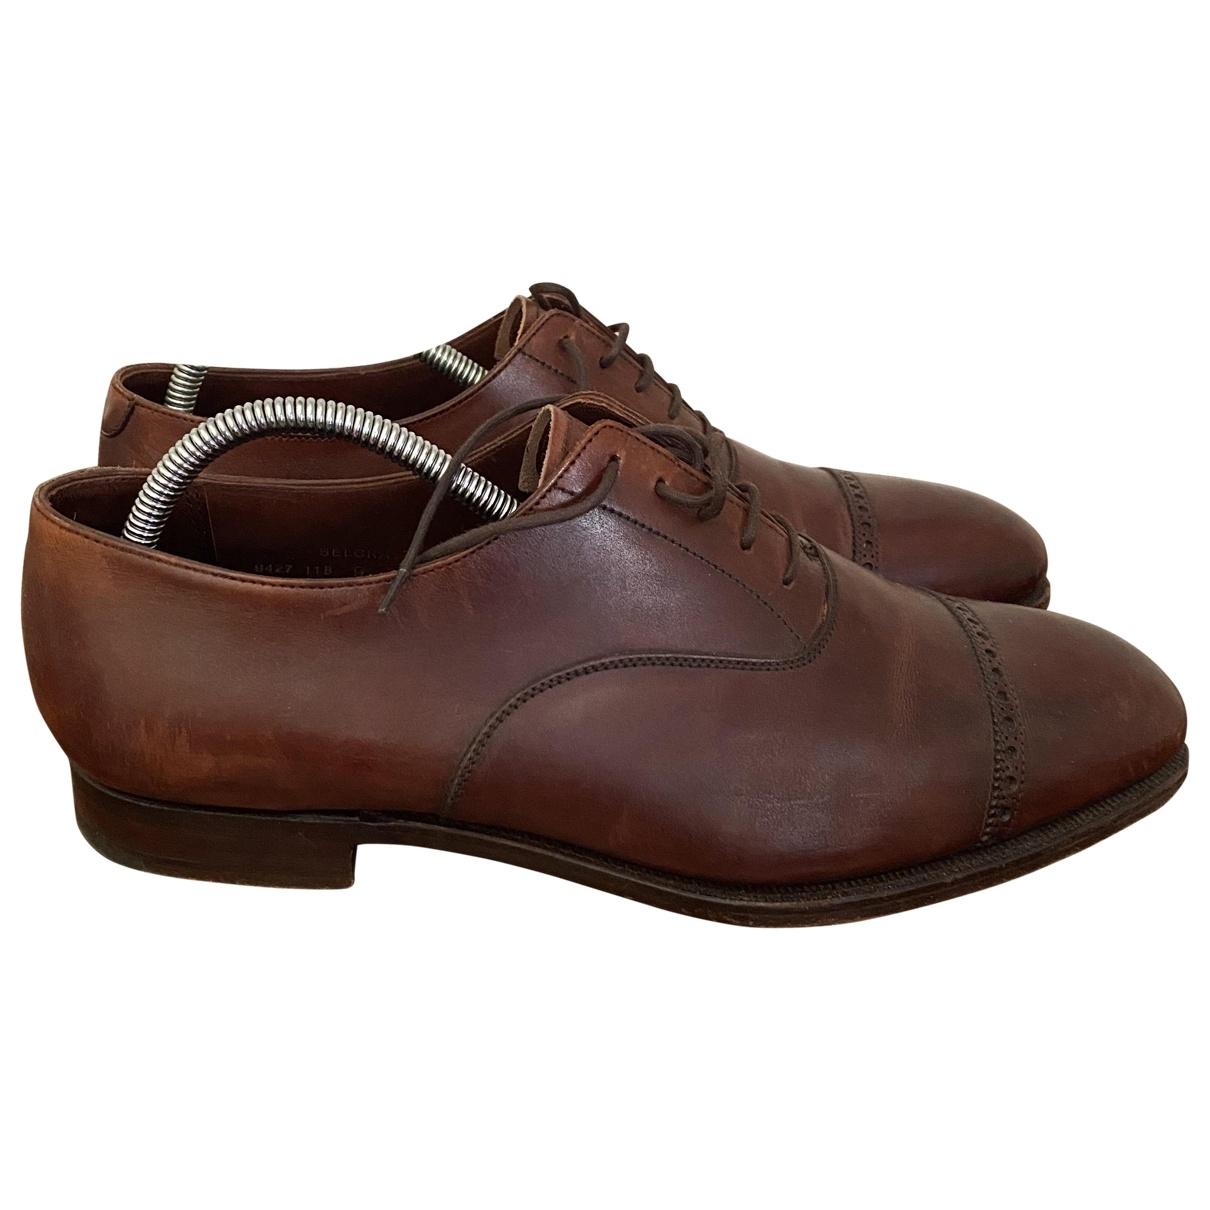 Crockett& Jones - Derbies   pour homme en cuir verni - marron